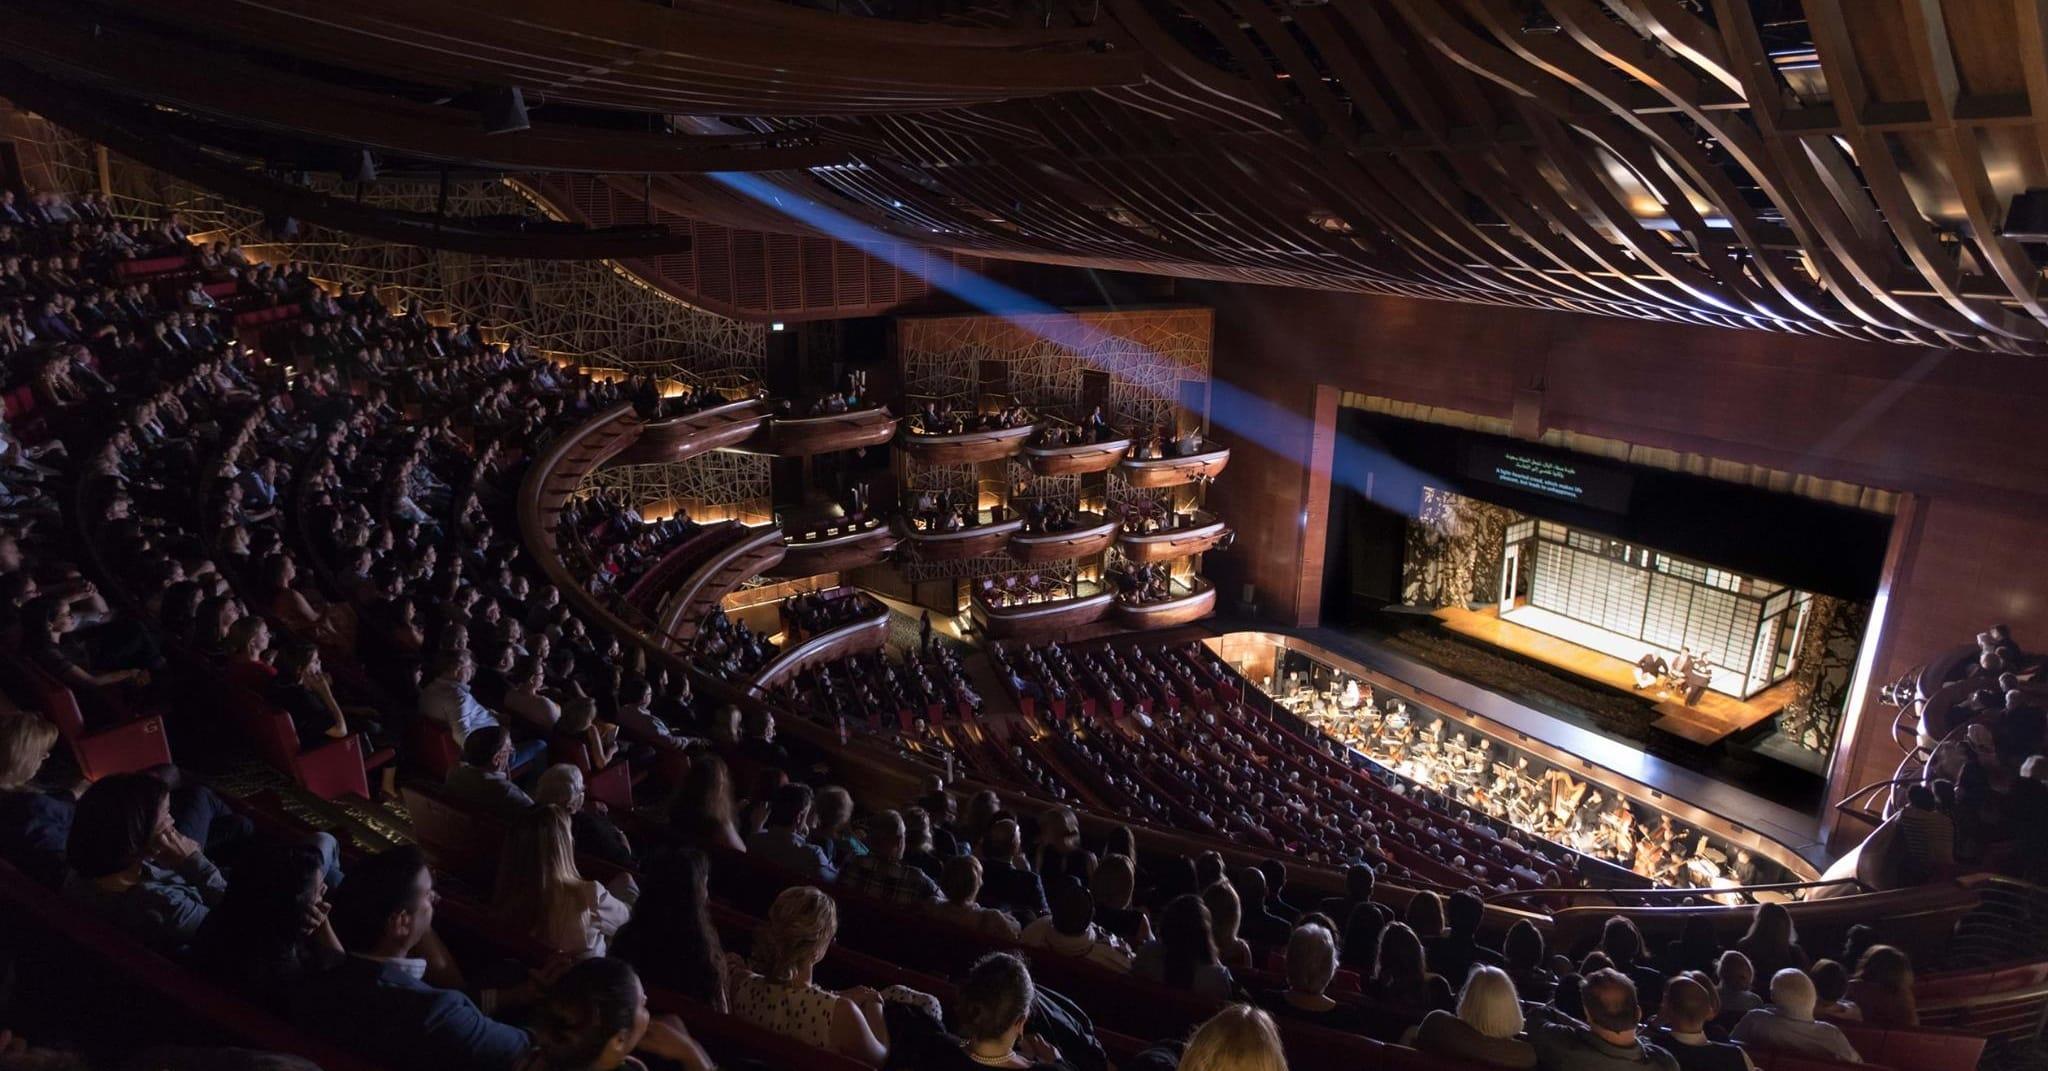 Shows at Dubai Opera